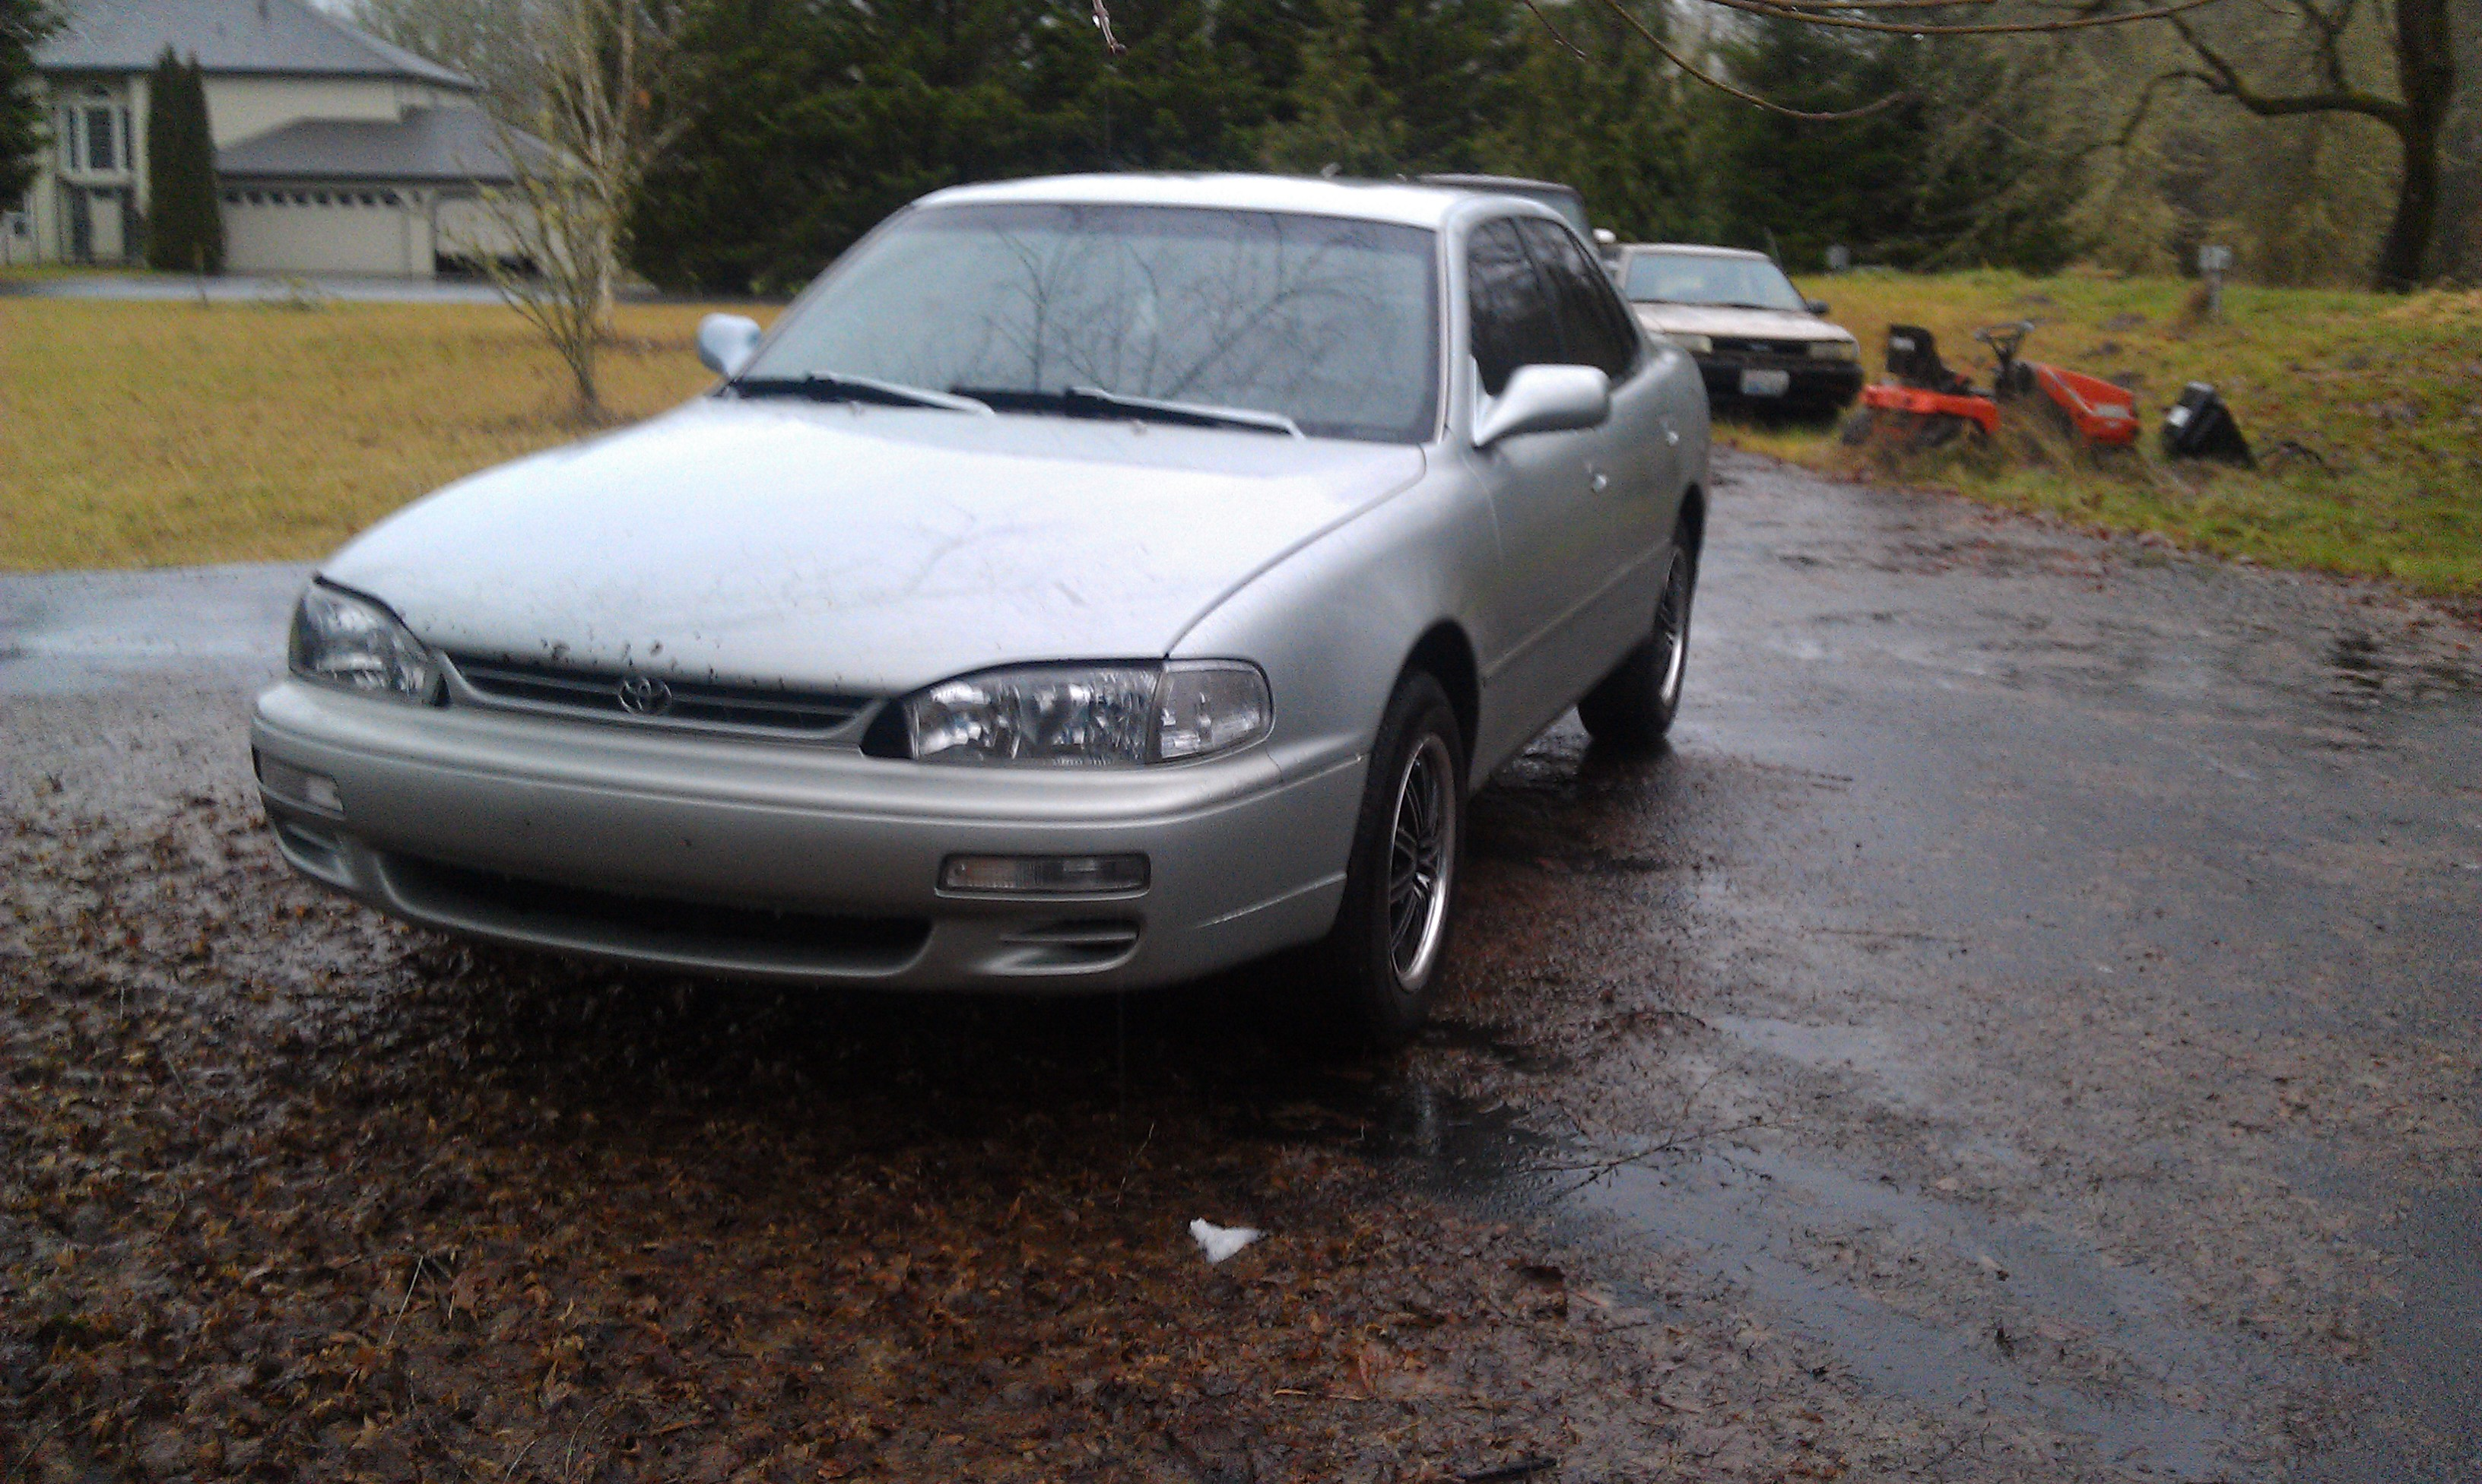 We Buy Junk Cars In Seattle: http://cashforcarsseattle.org/we-buy-junk-cars-seattle